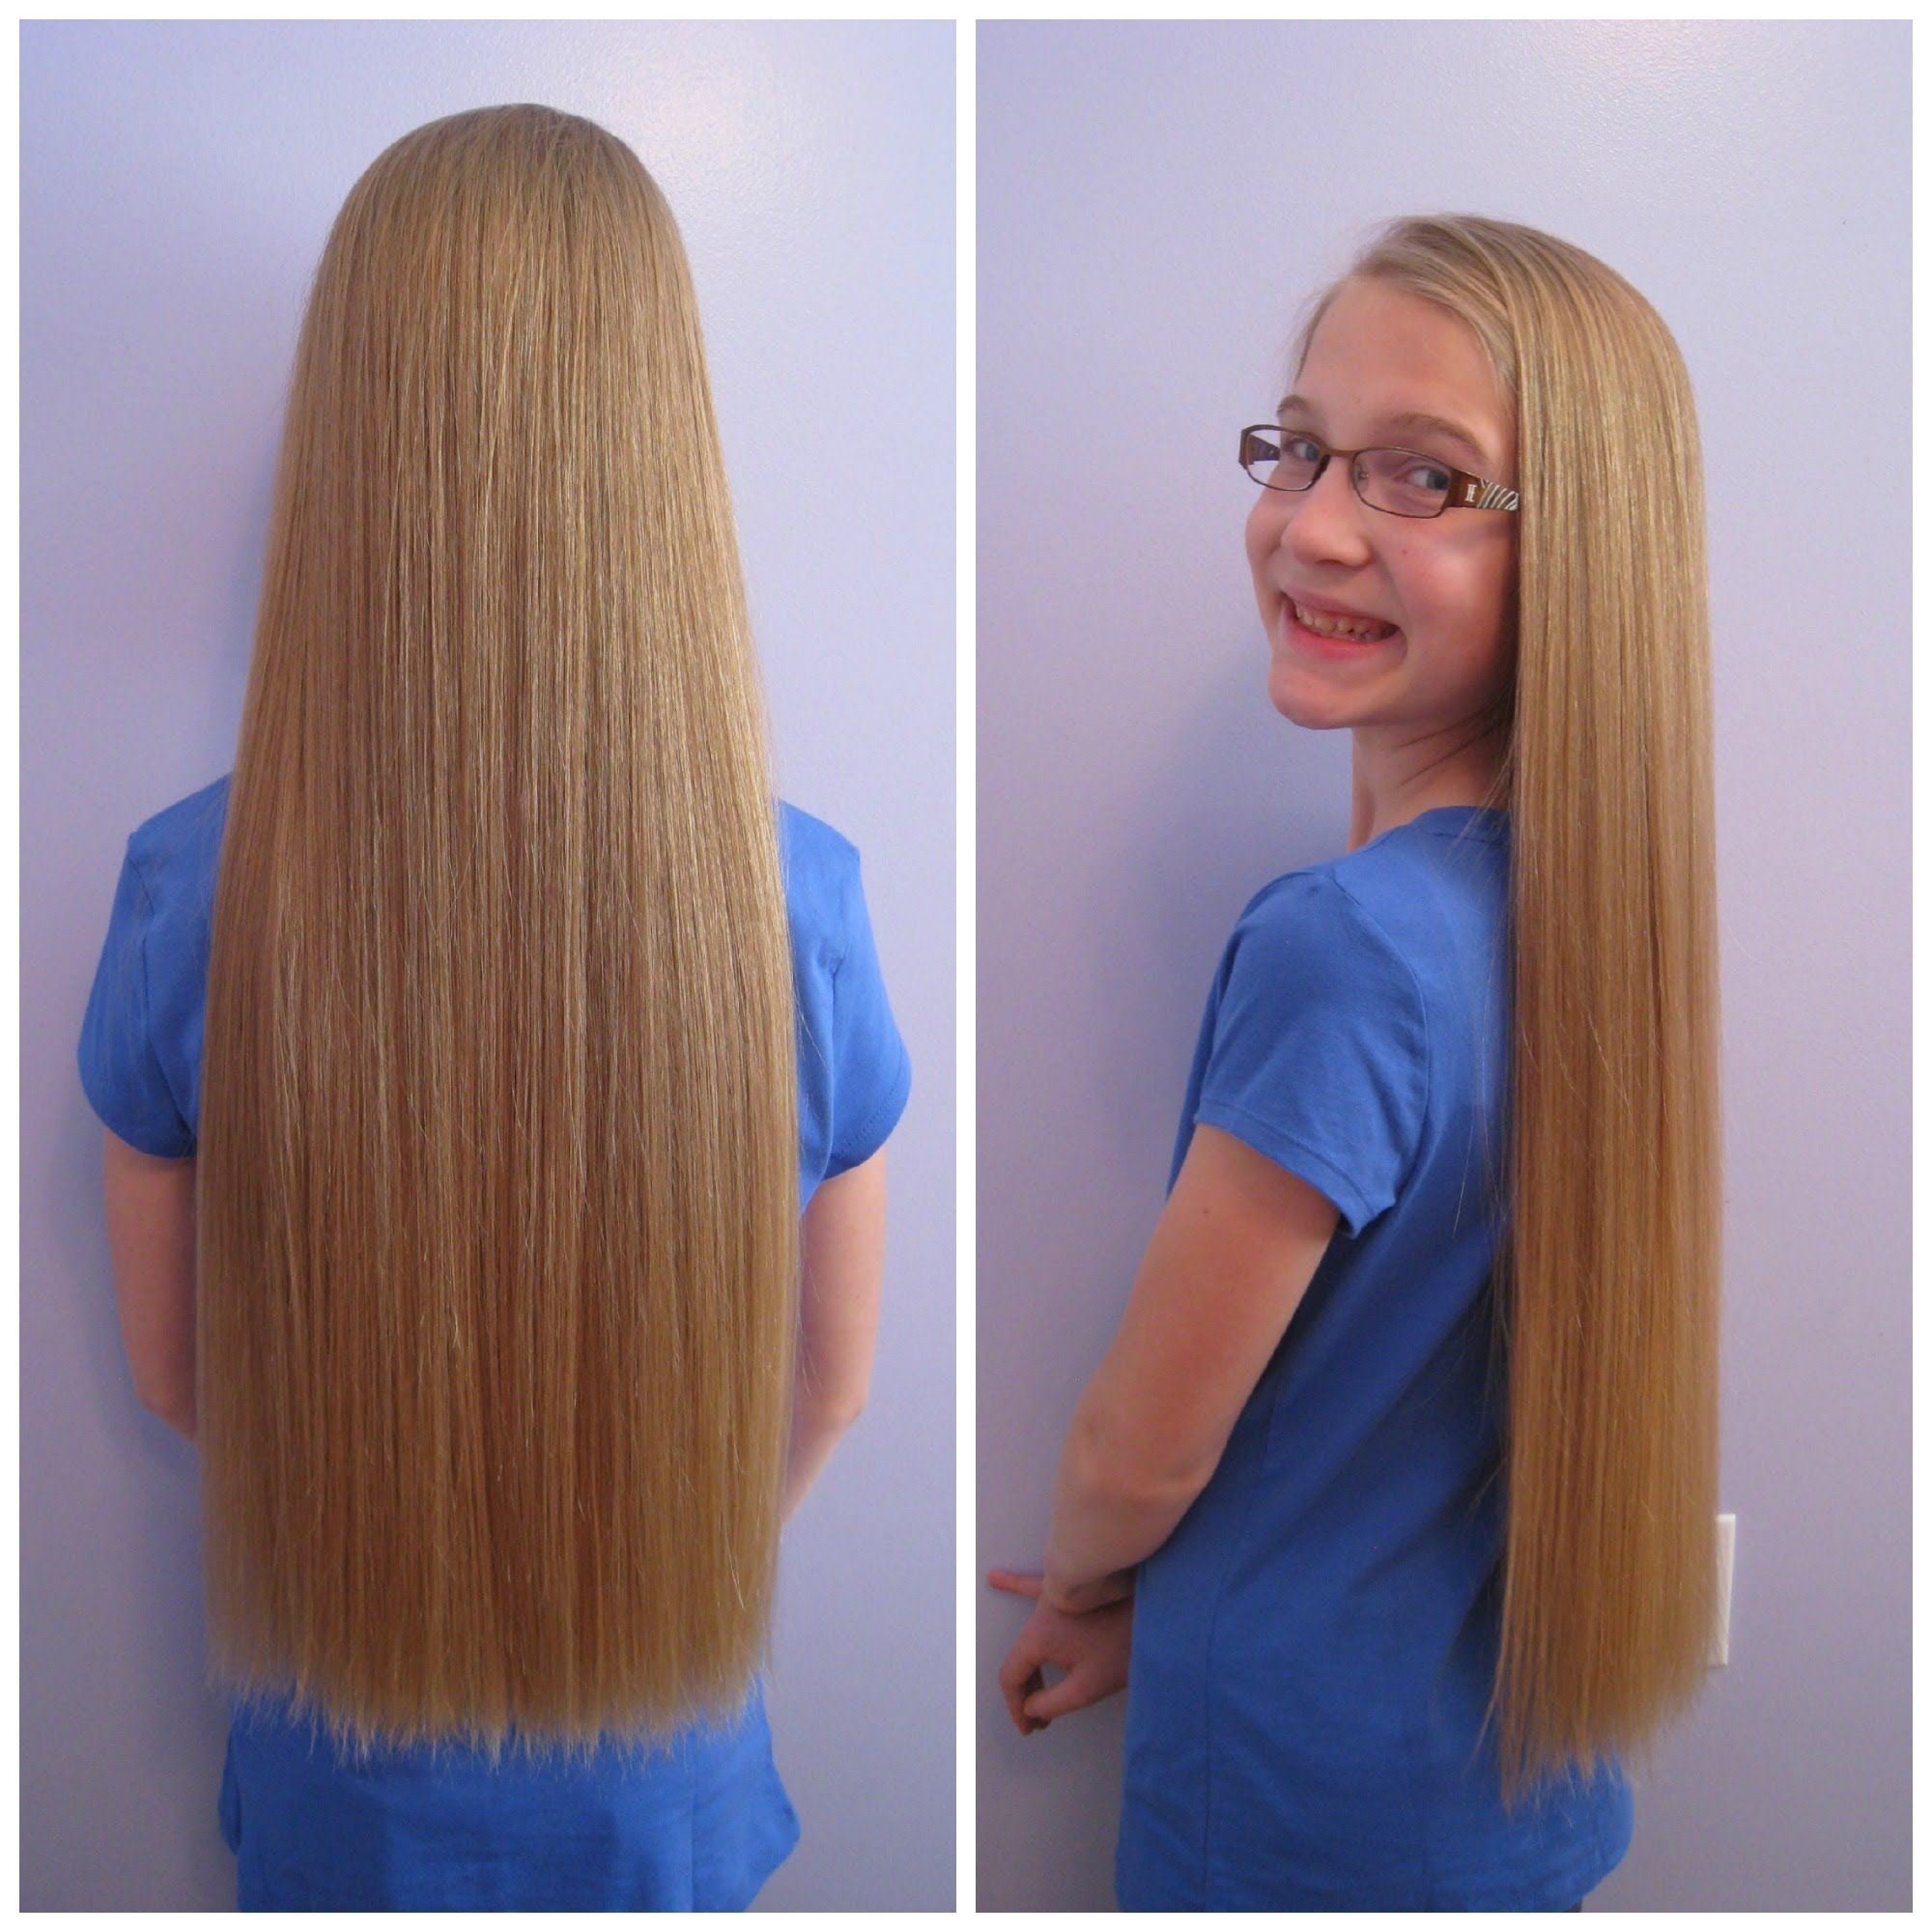 Long Hair to Shorter Hair Locks of Love Haircut